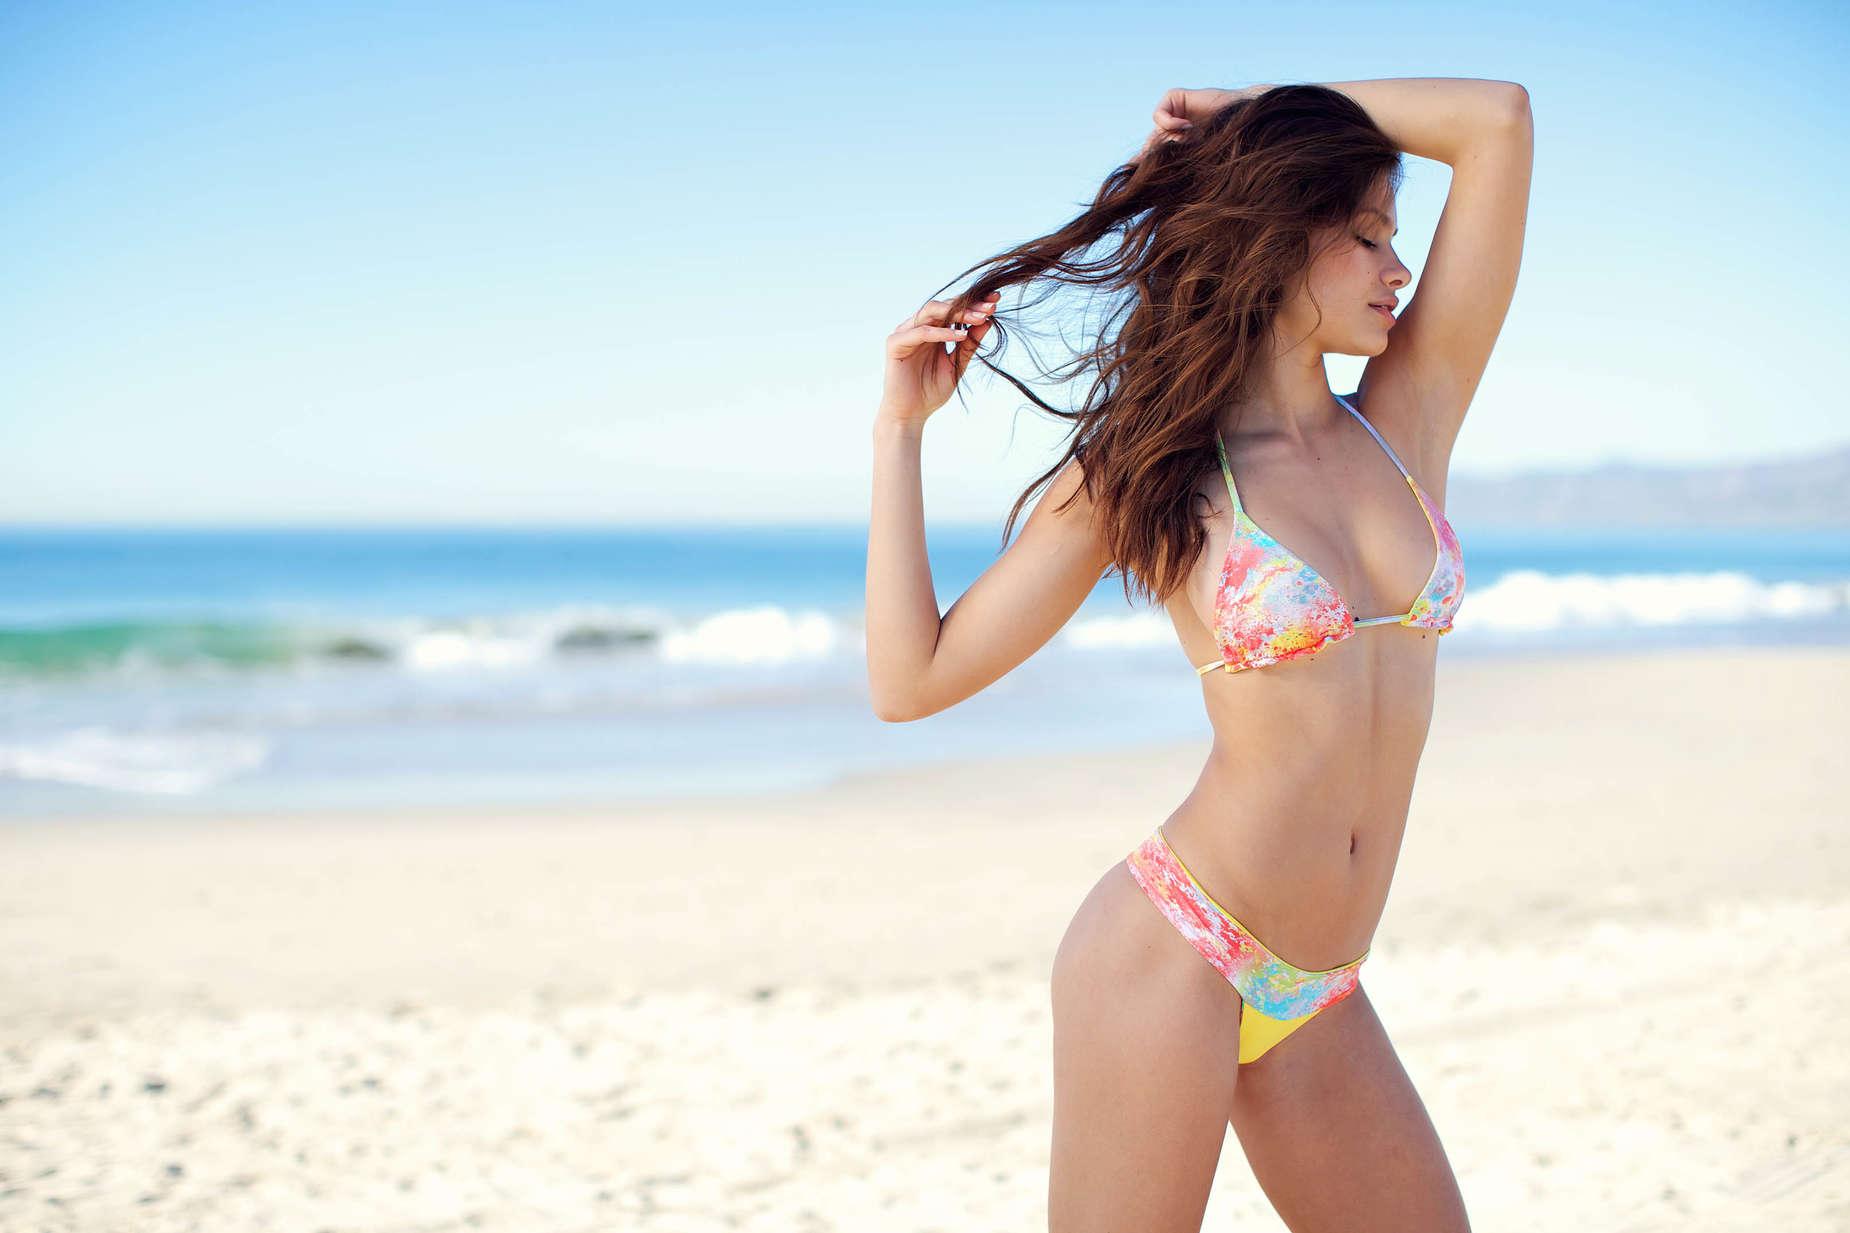 Bikini's girls